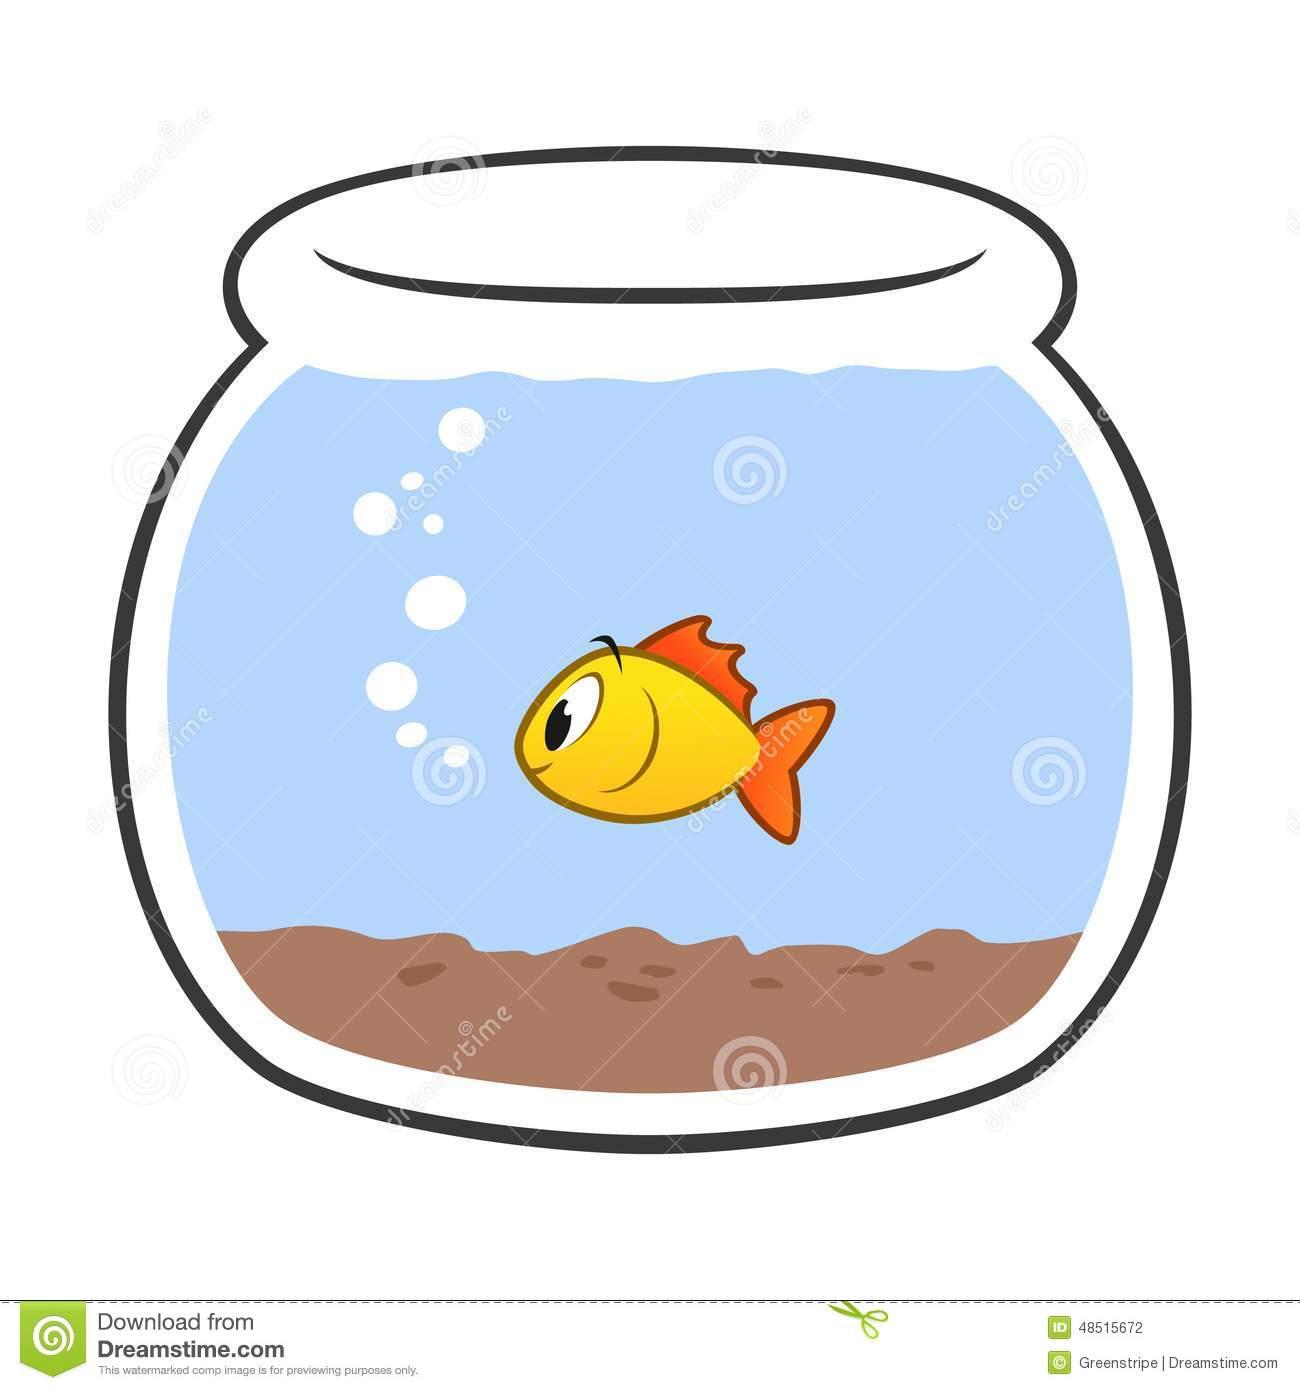 Goldfish Fish Bowl Clip Art Royalty Free Stock Photo.